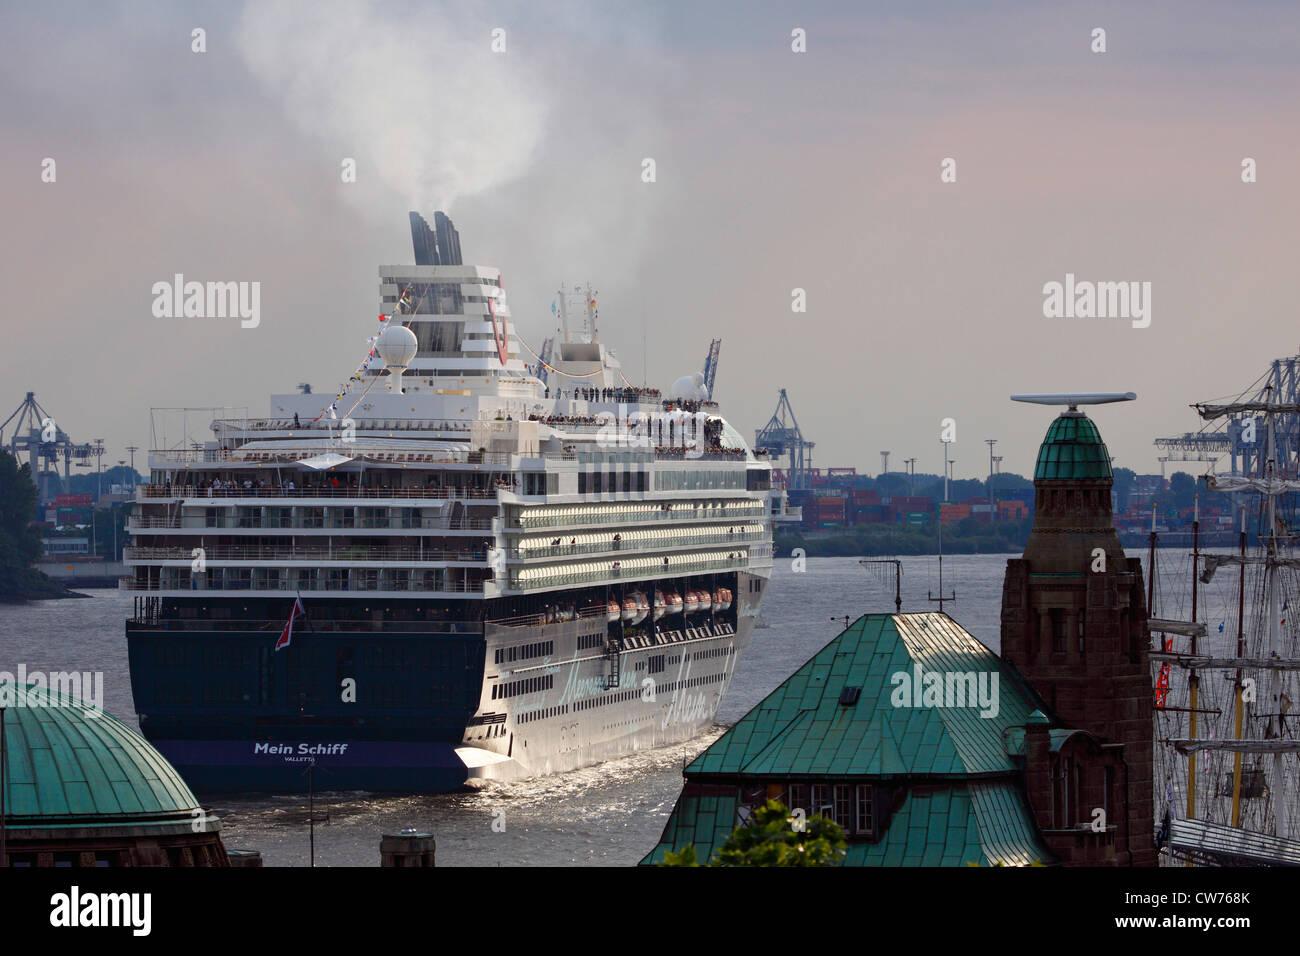 sailing Cruise Ship Mein Schiff , Germany, Hamburg - Stock Image